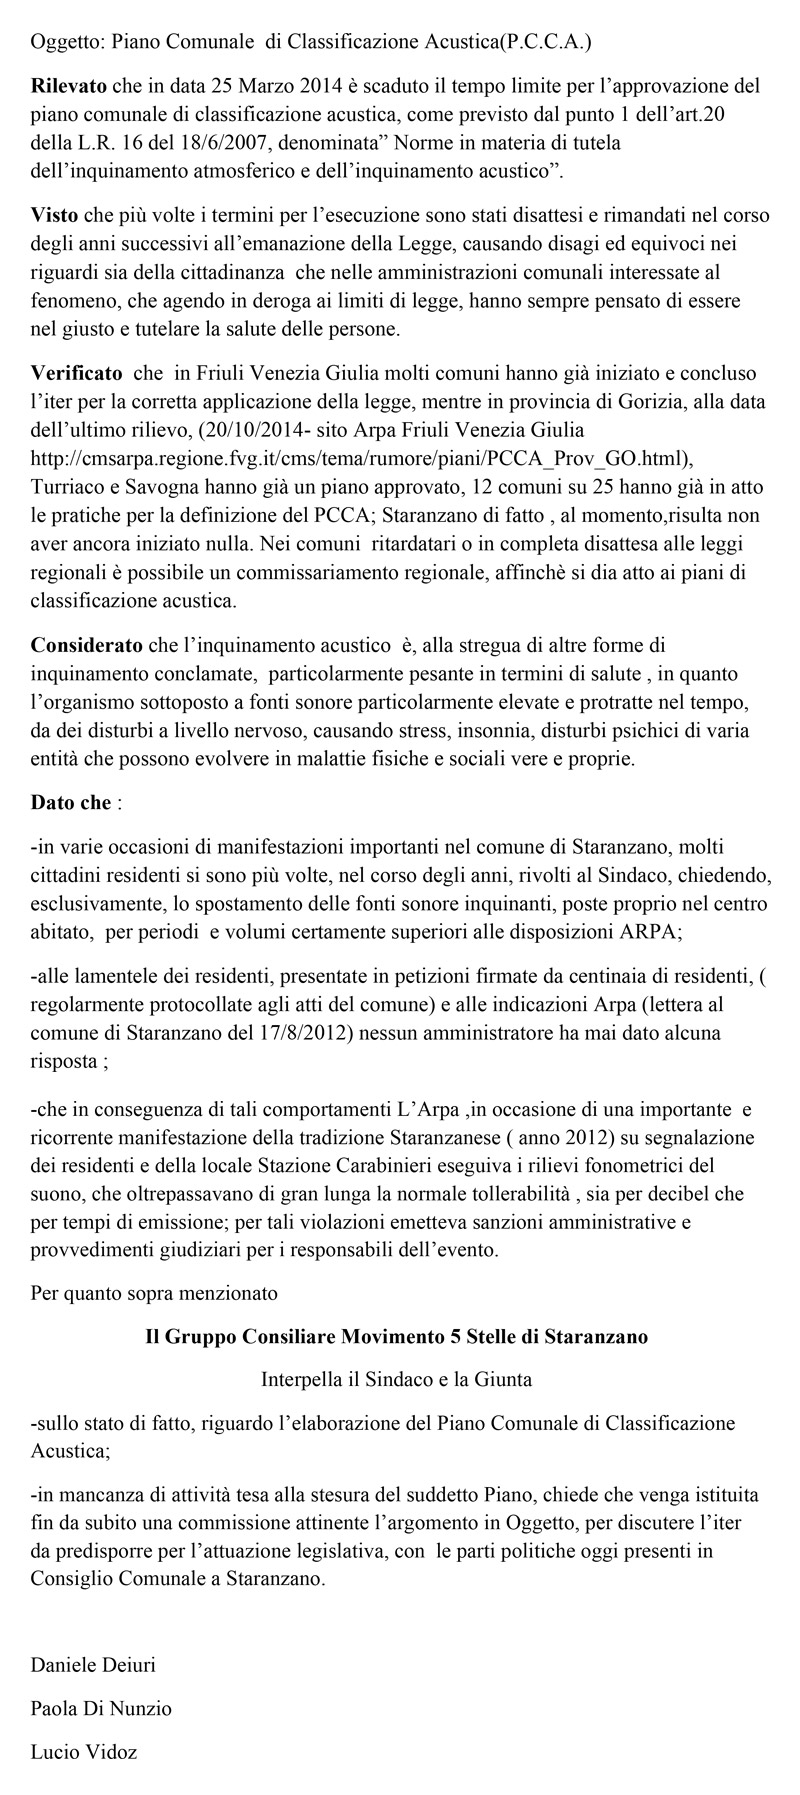 interpellanza_piano_acustico_pcca